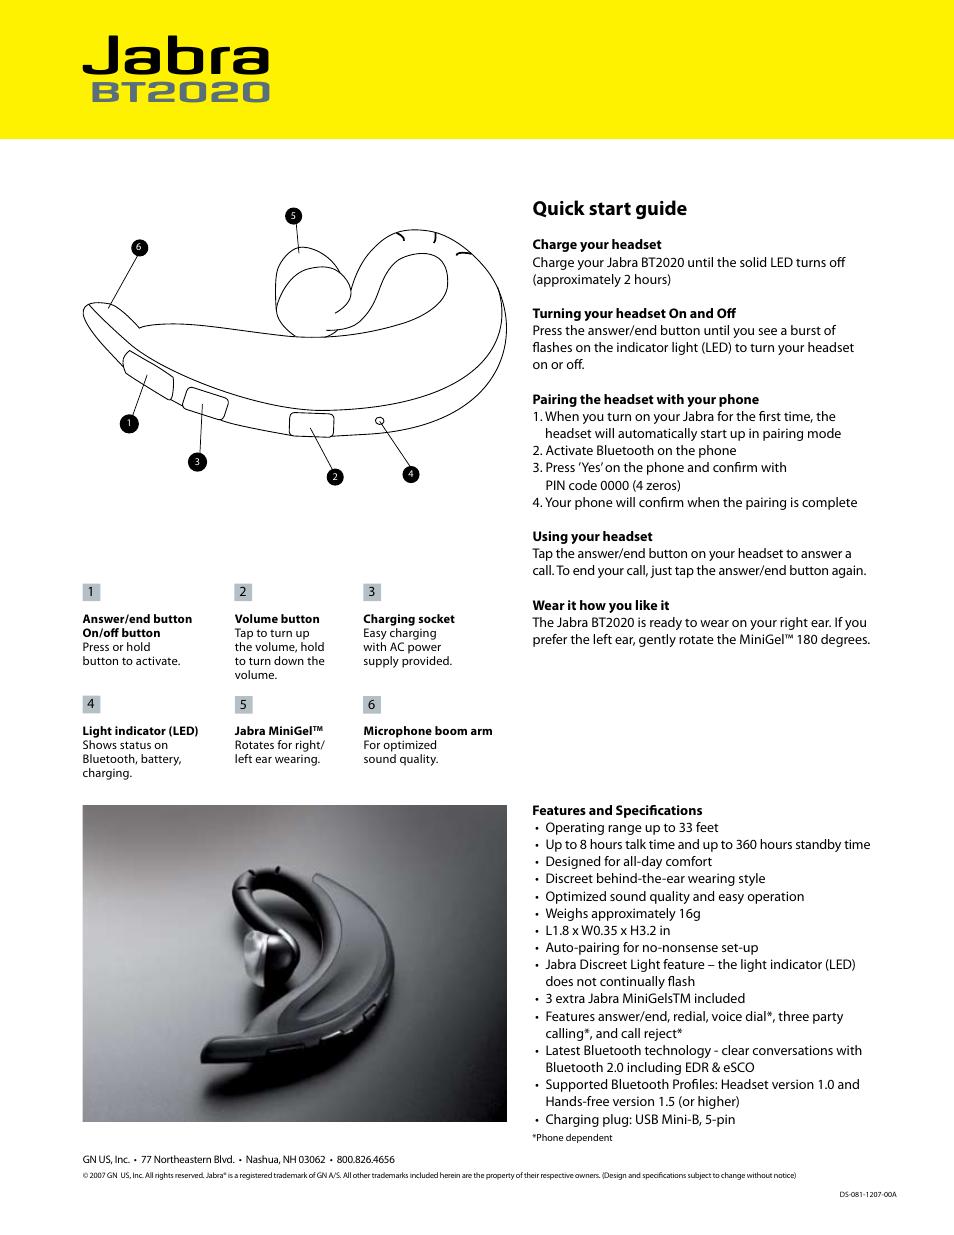 Jabra Bt2020 Quick Start Guide Jabra Bt2020 User Manual Page 2 2